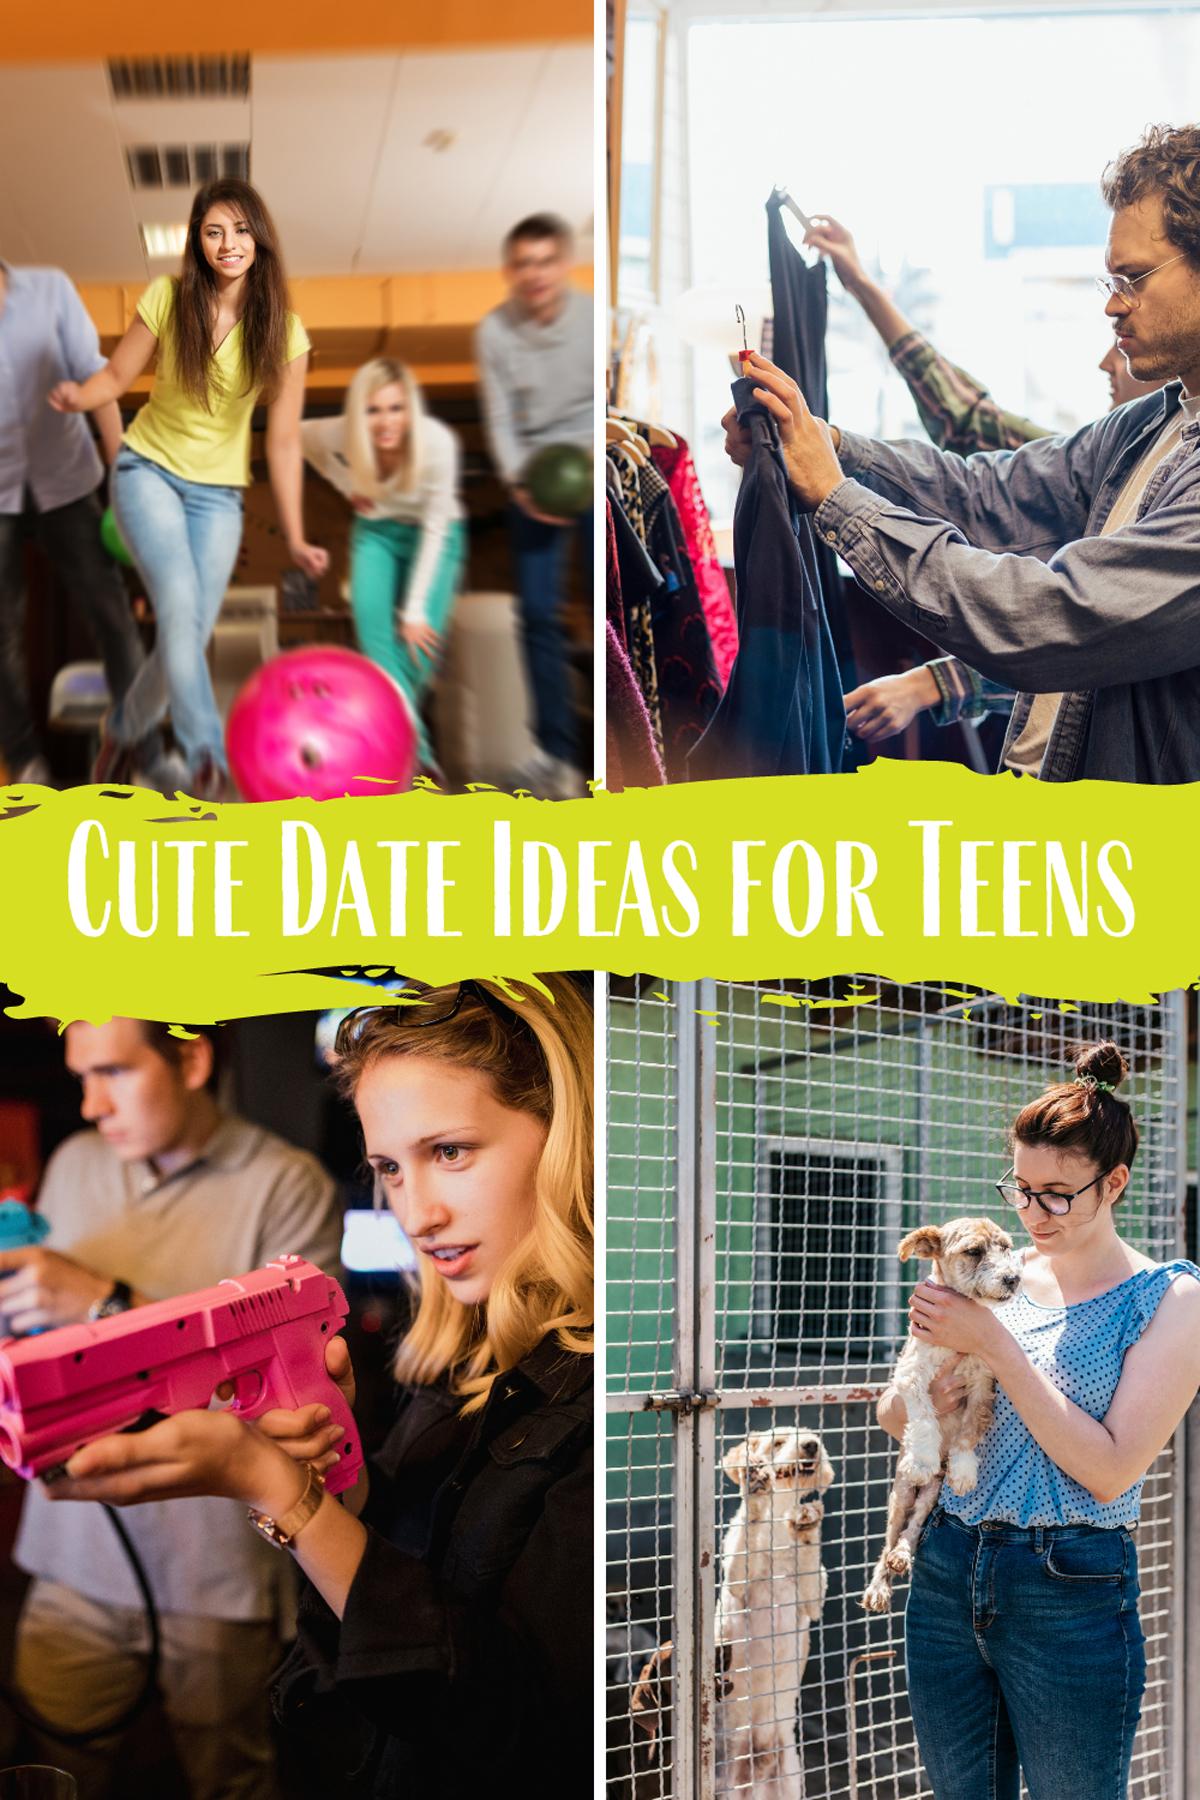 Teenager Activities For Dates